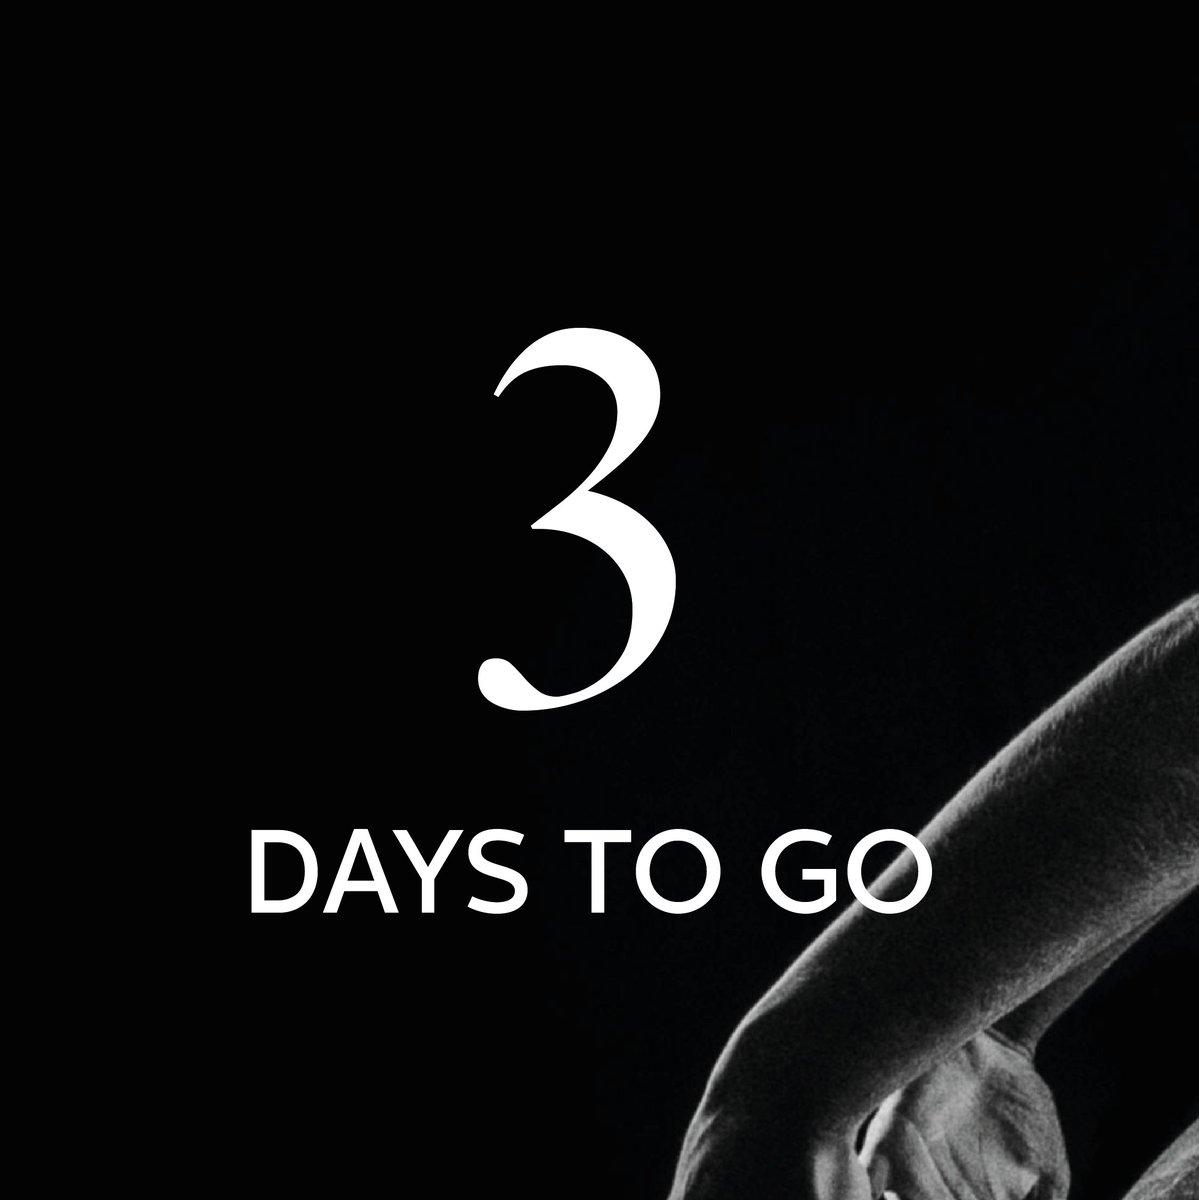 3 days to go until the launch of our Allora Range.  Don't miss out. #allora #kellarsflooring #design #homeinspo #homeimprovement #flooring #trending #homedecor https://t.co/6DT7C6AQDb